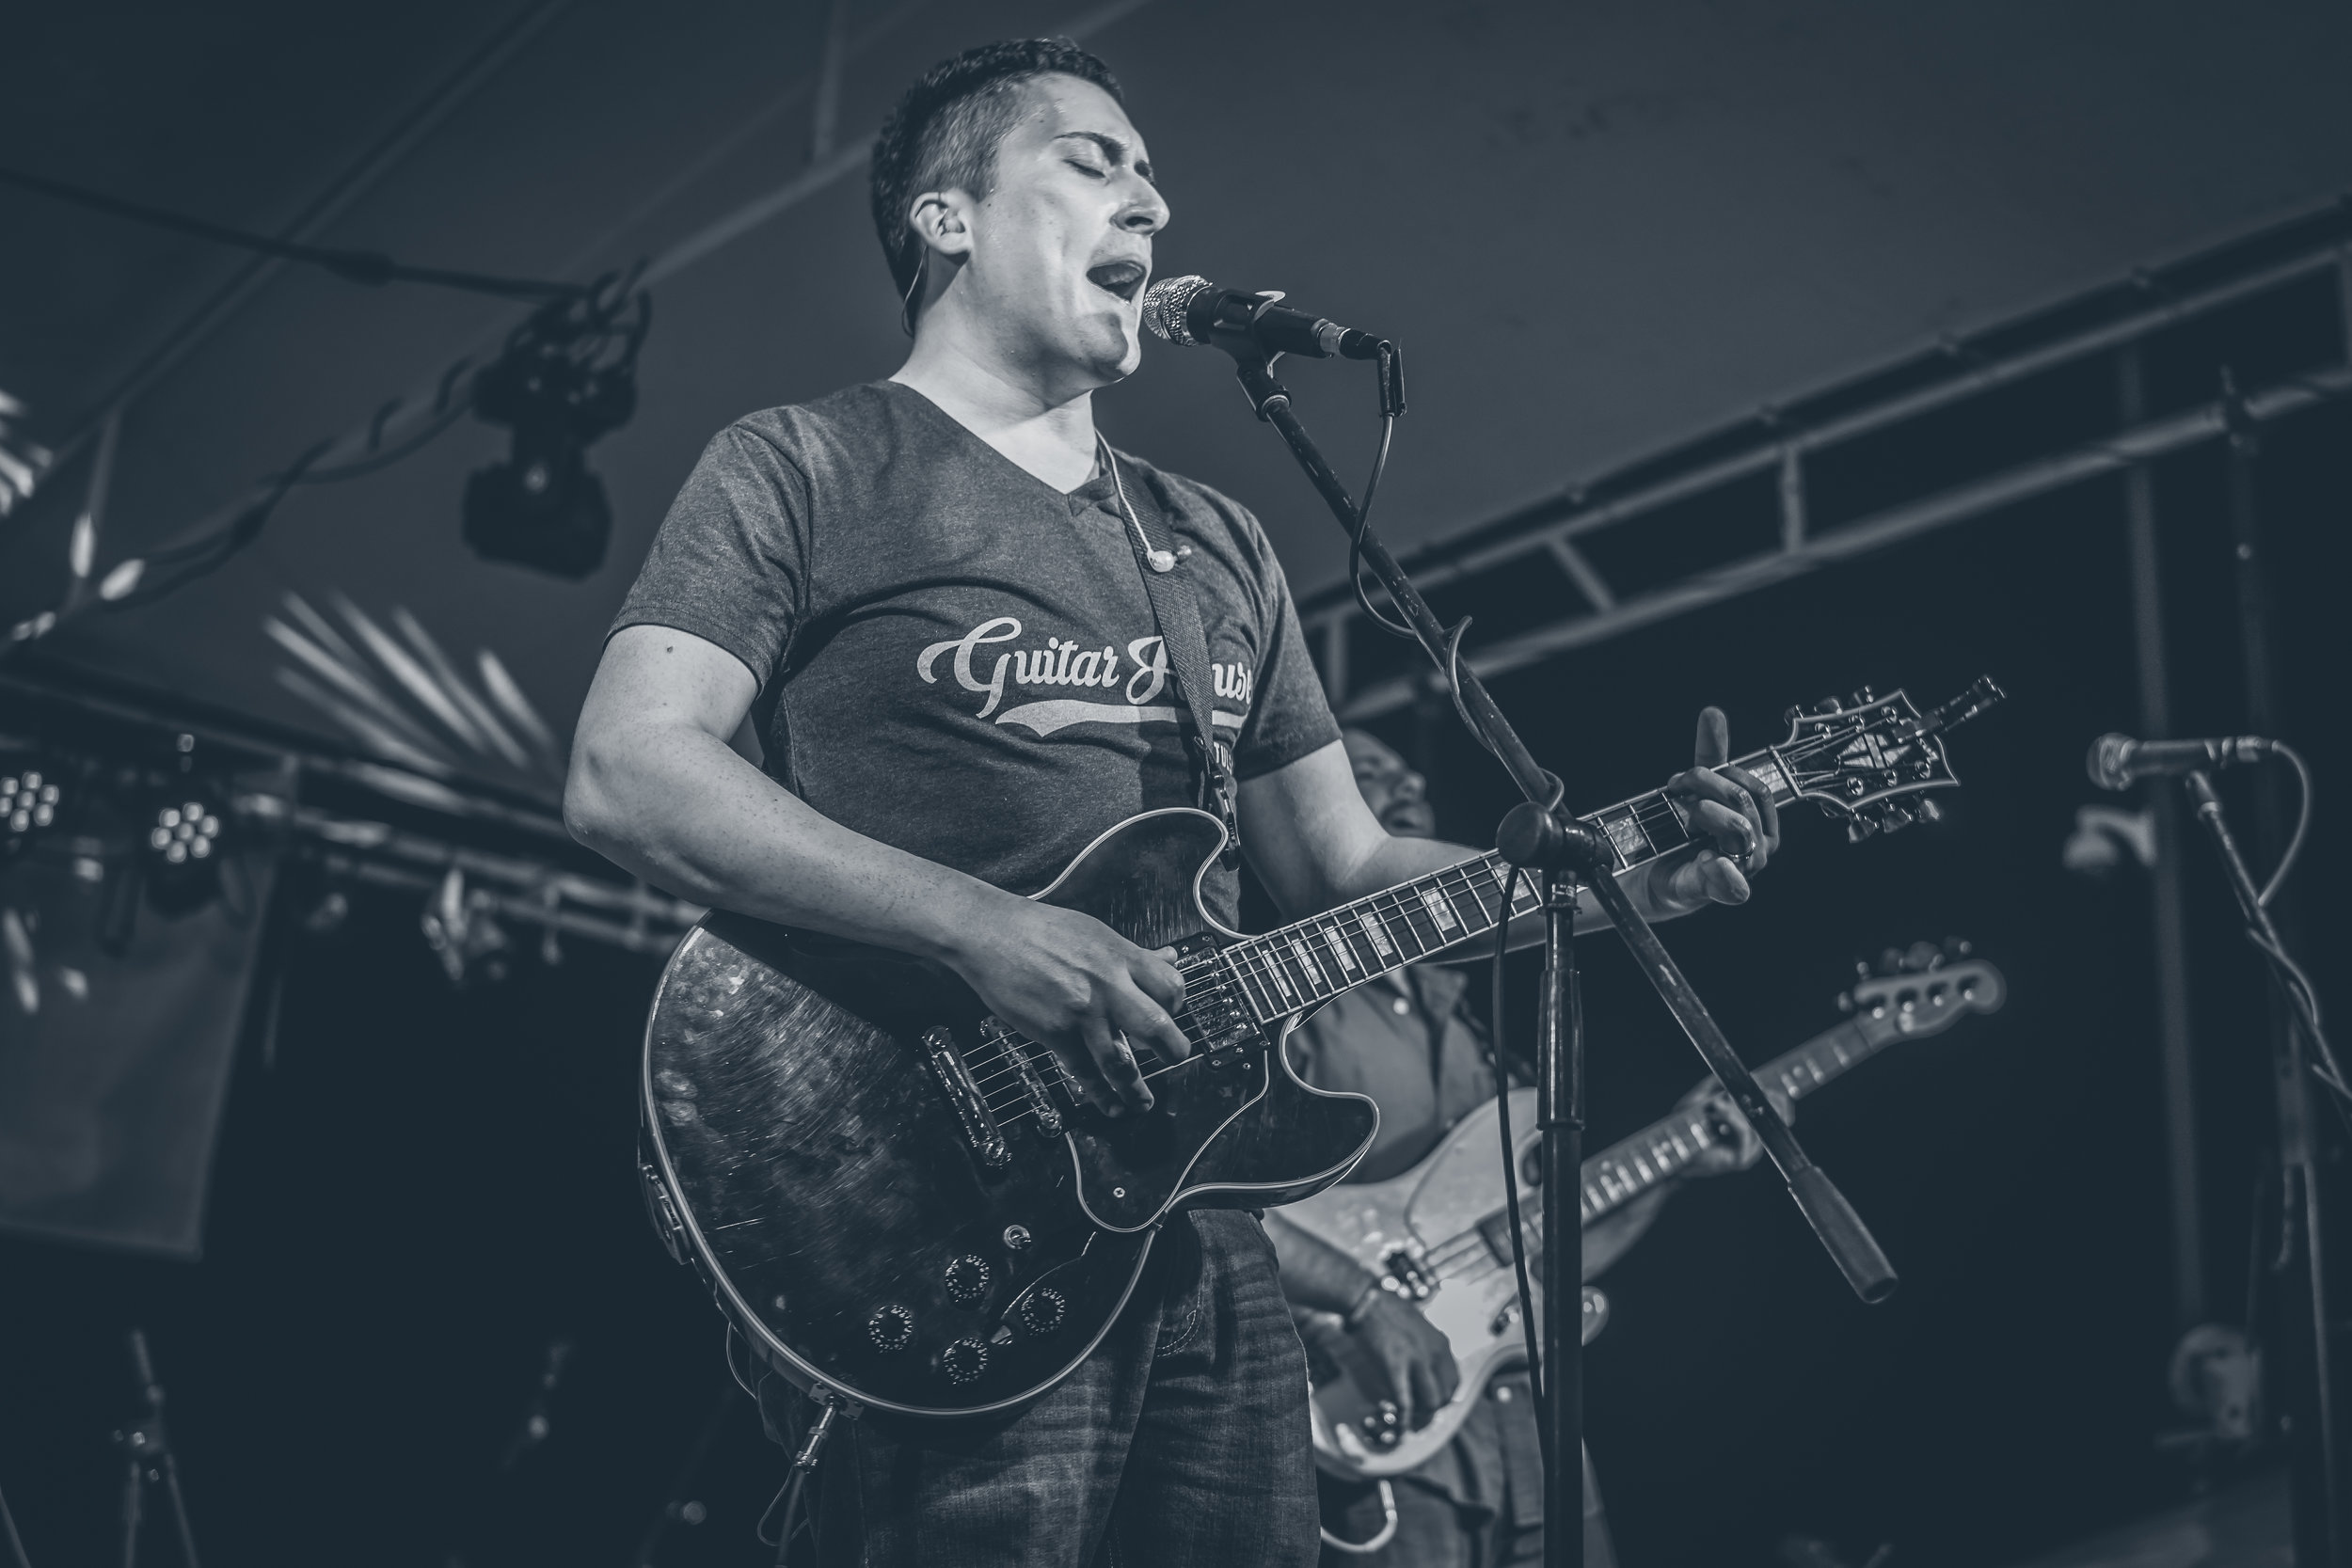 FM Pilots - Blue Dome Arts Festival - Tulsa, OK 052116-12.jpg